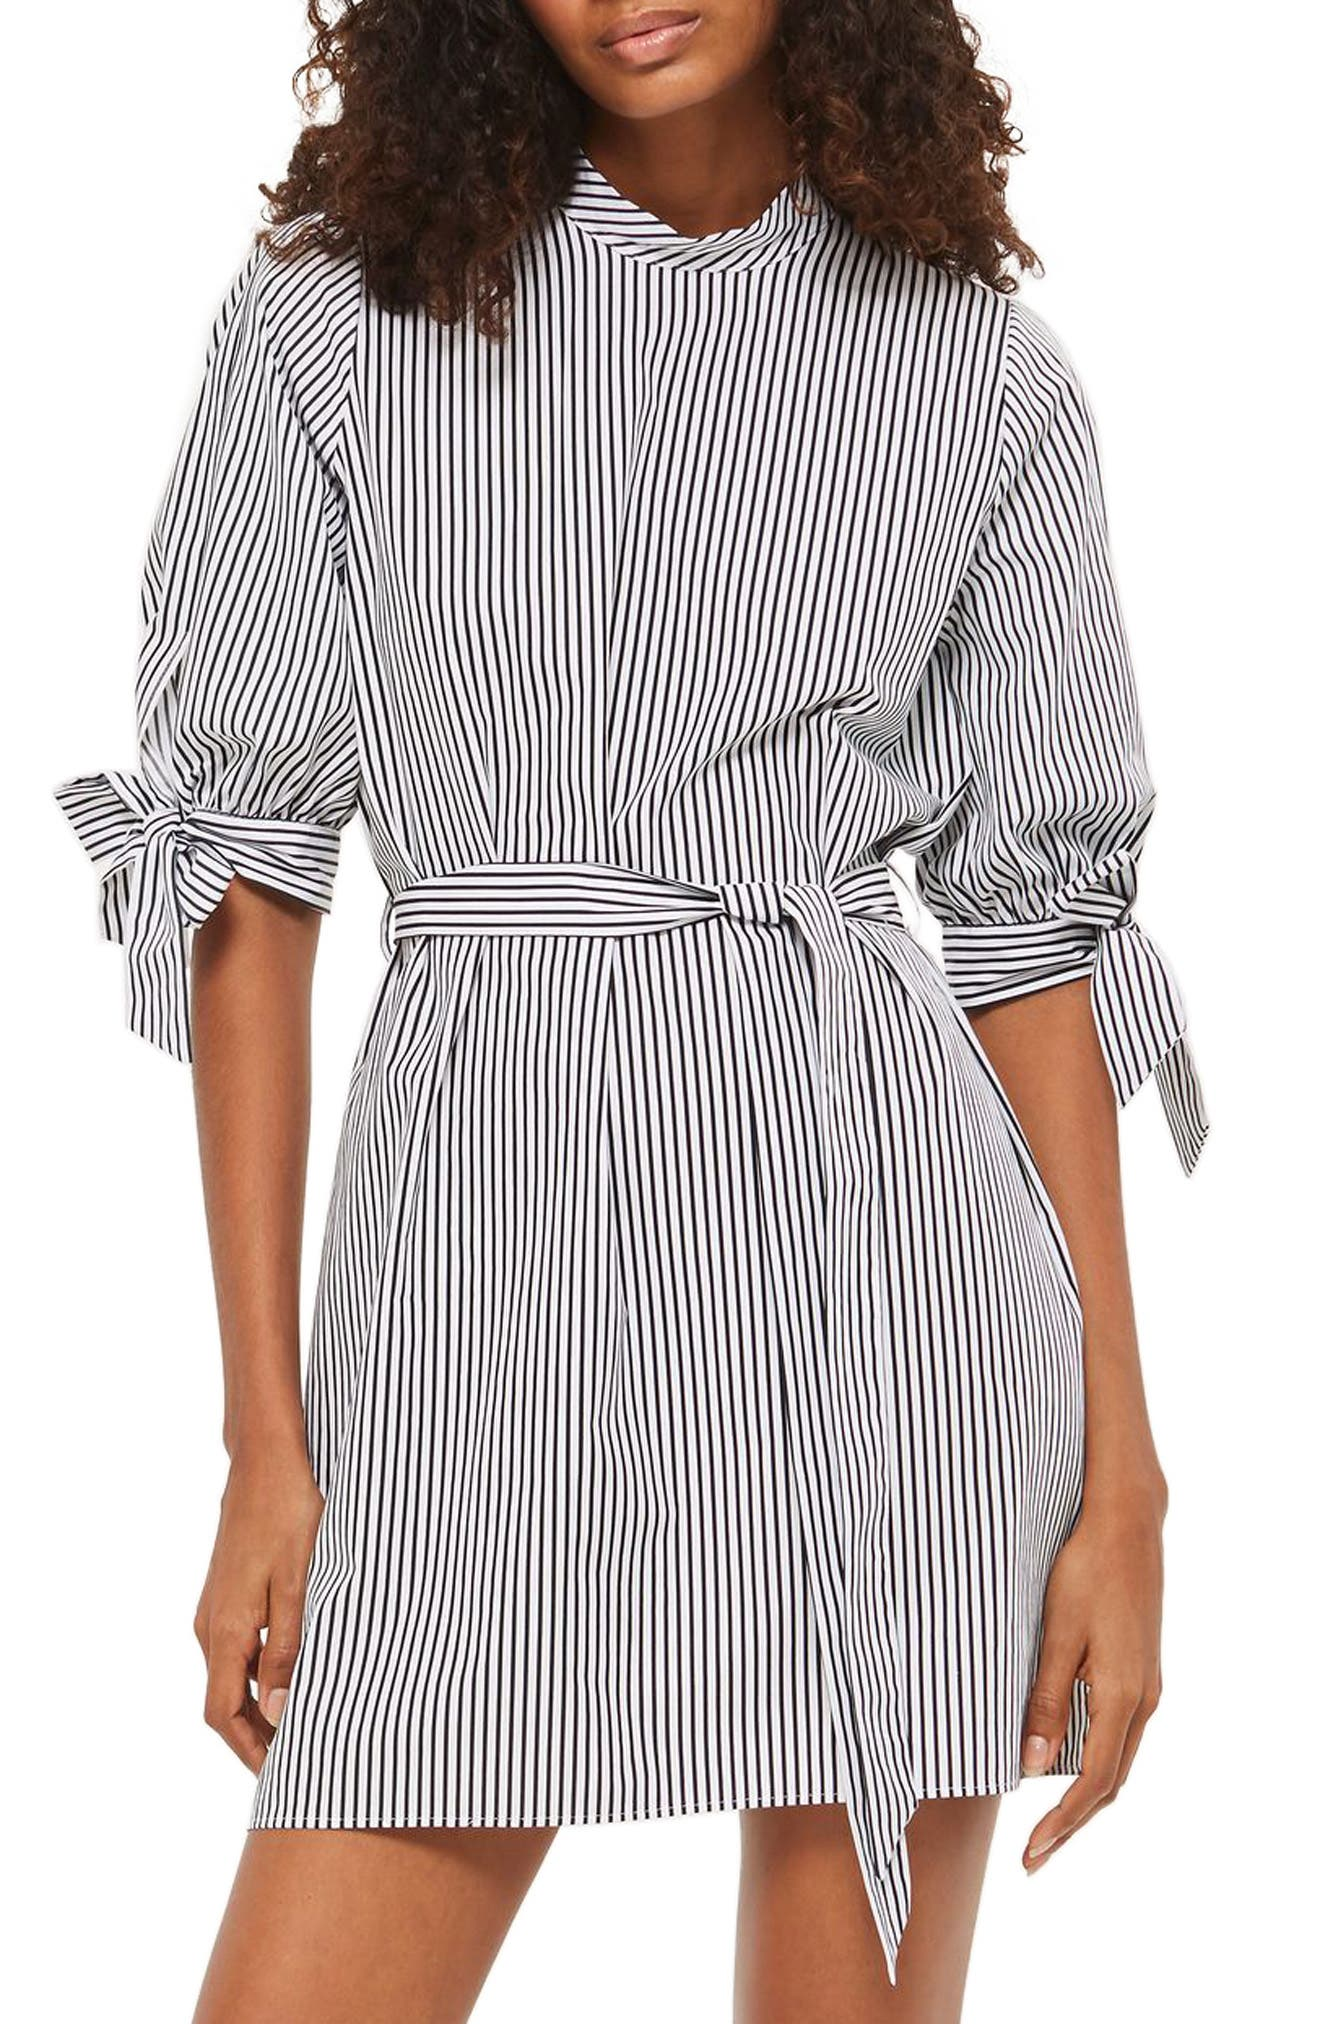 Topshop Stripe Belted Poplin Shift Dress